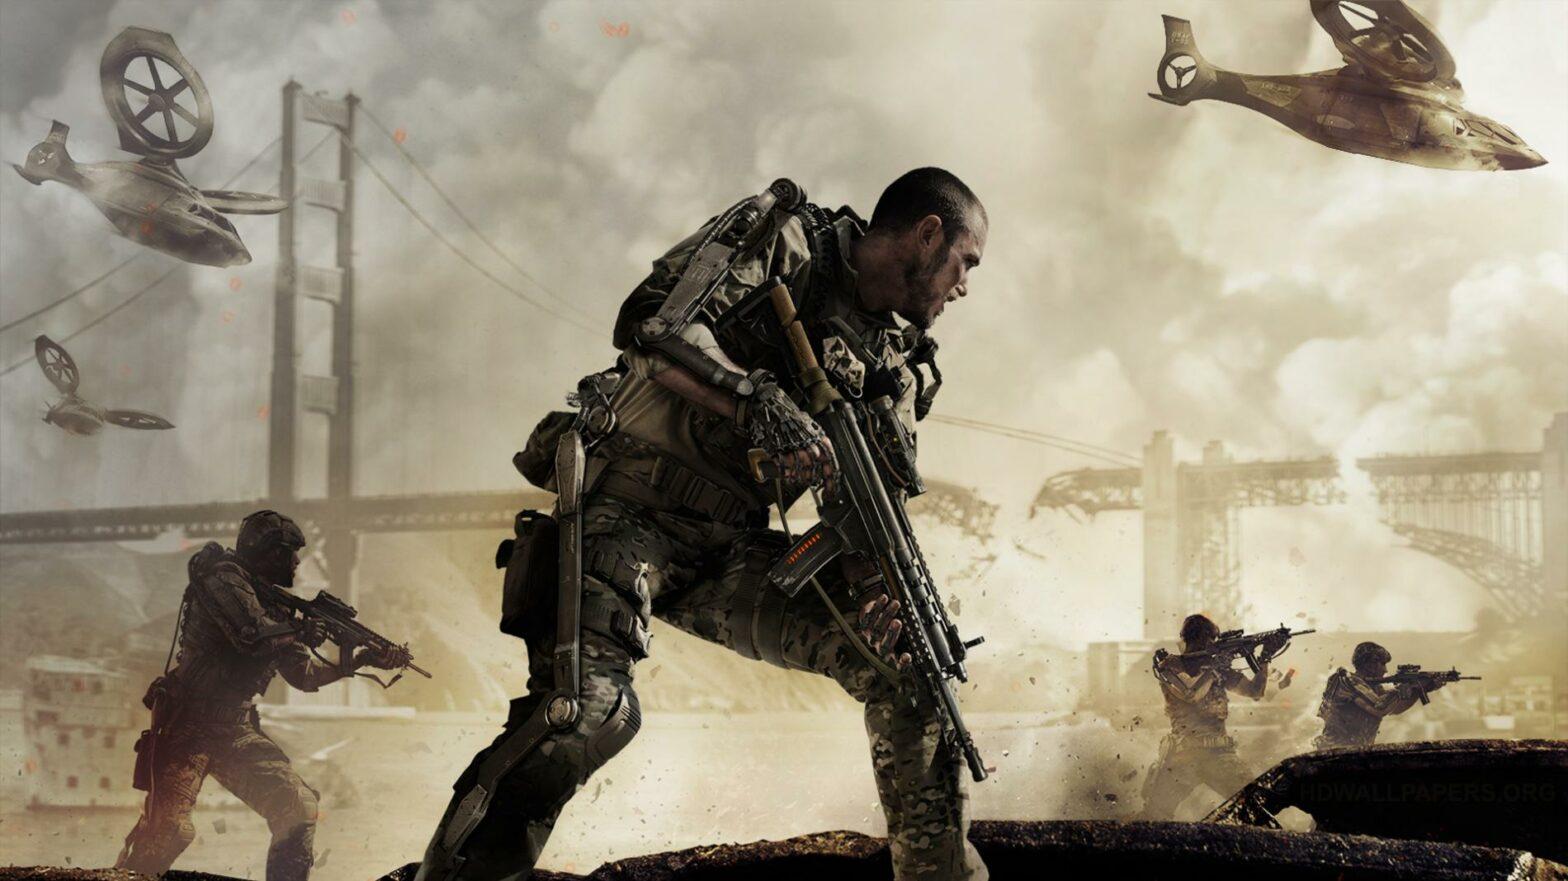 Neuer Trailer zum CoD: Advanced Warfare-DLC Ascendance